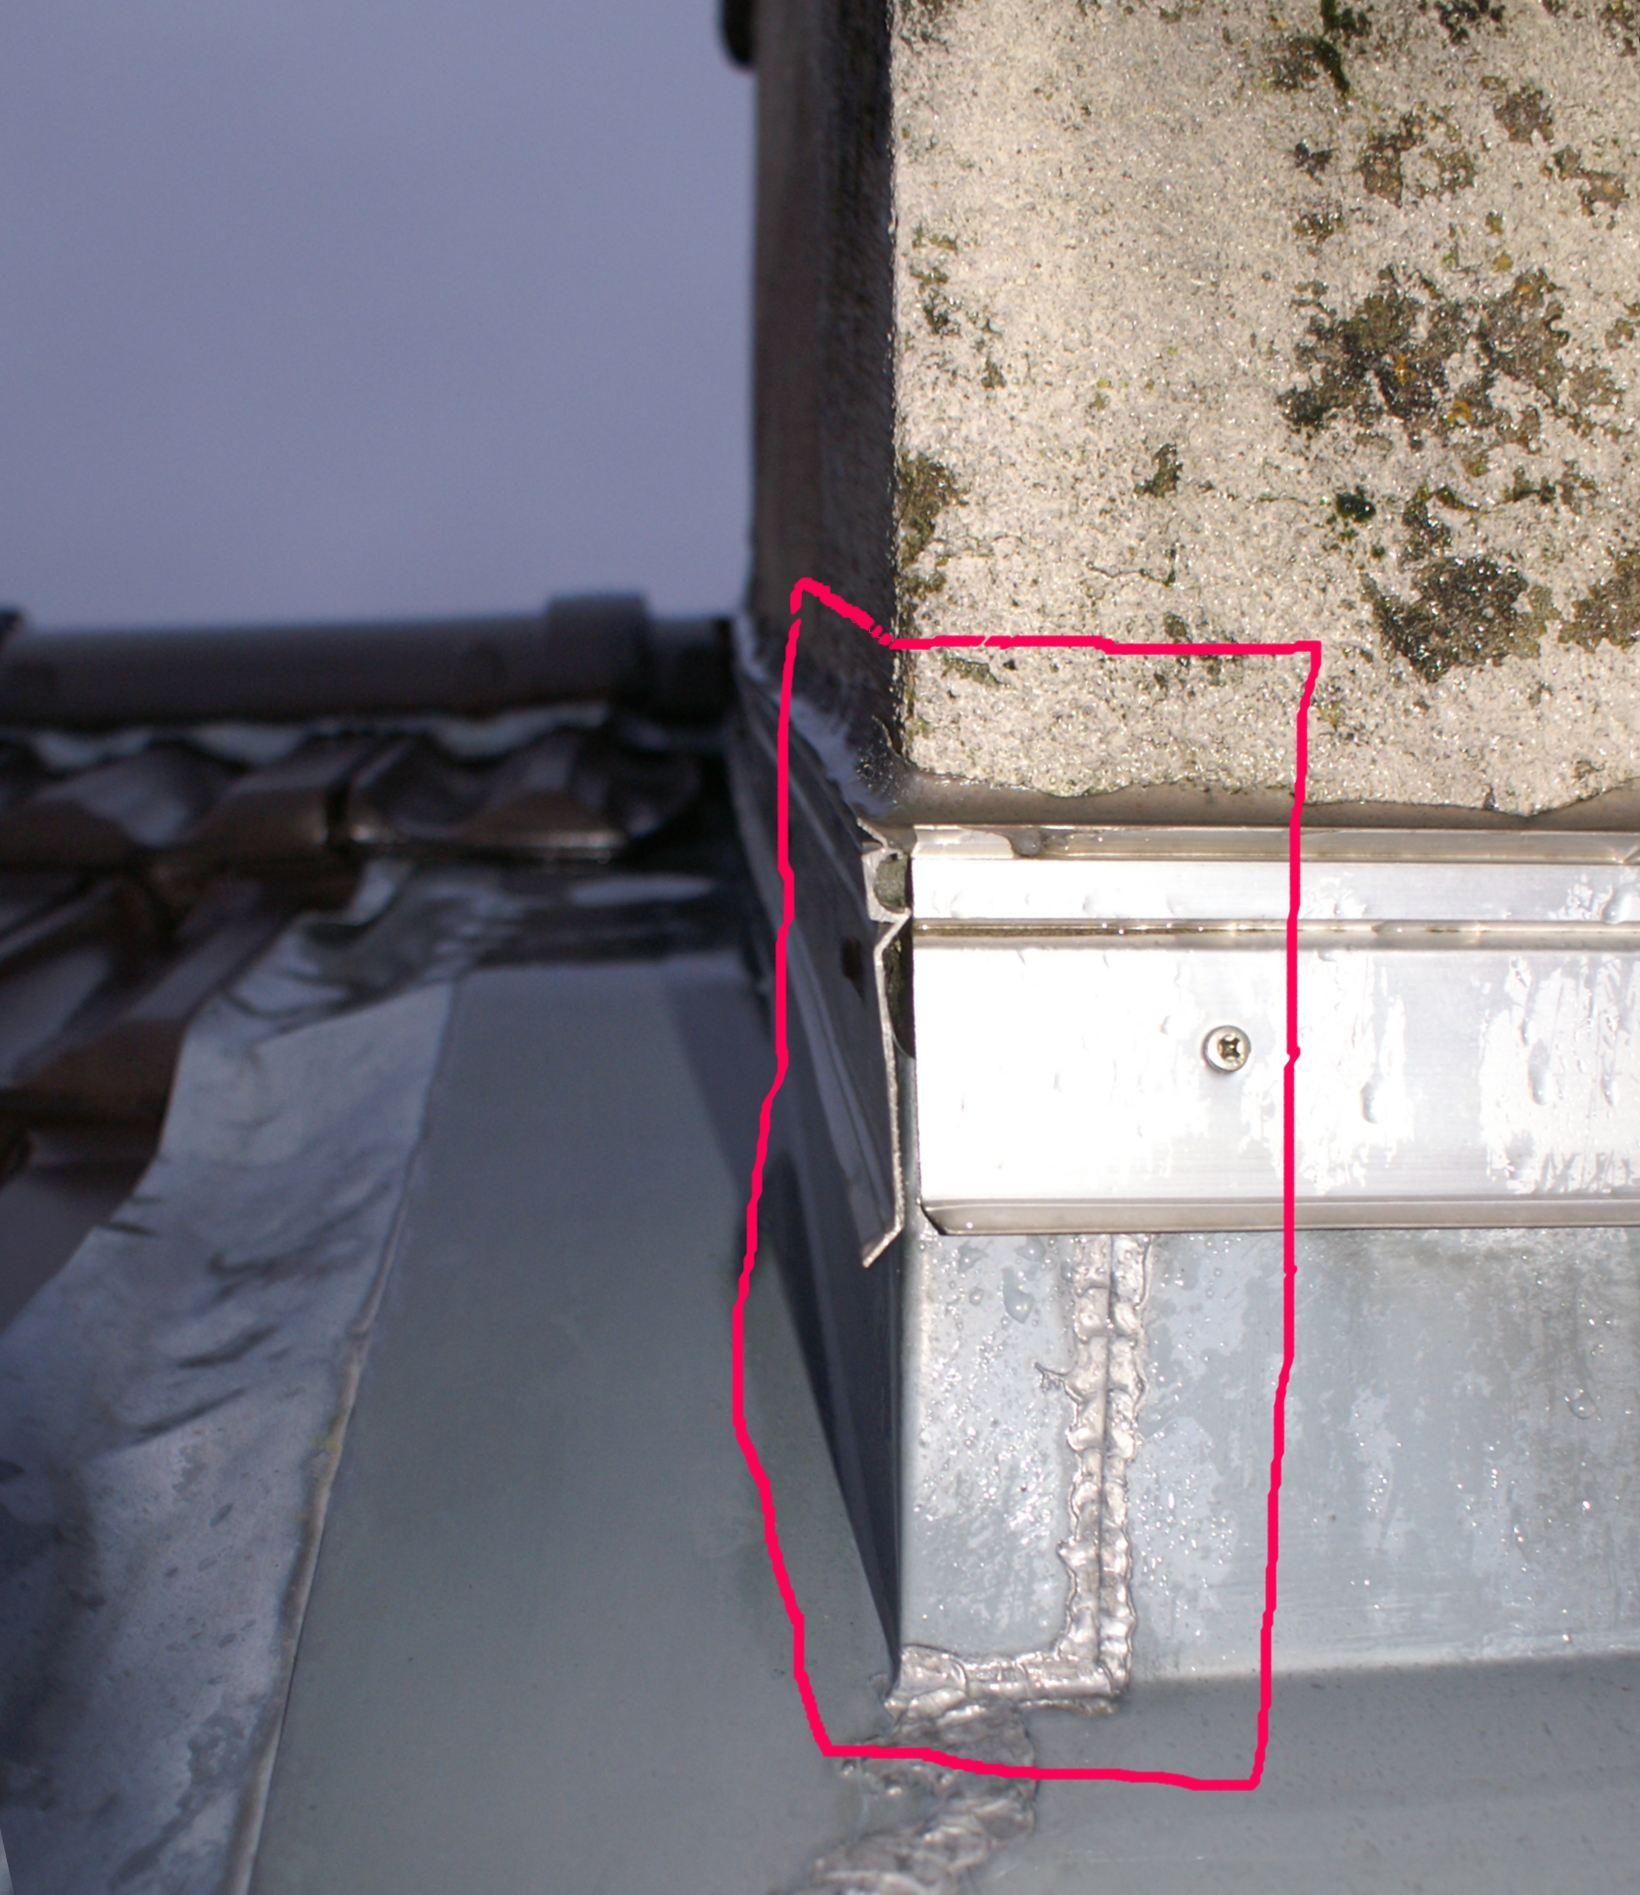 bande solin en zinc avec platine plomb si c est toit plat sur. Black Bedroom Furniture Sets. Home Design Ideas